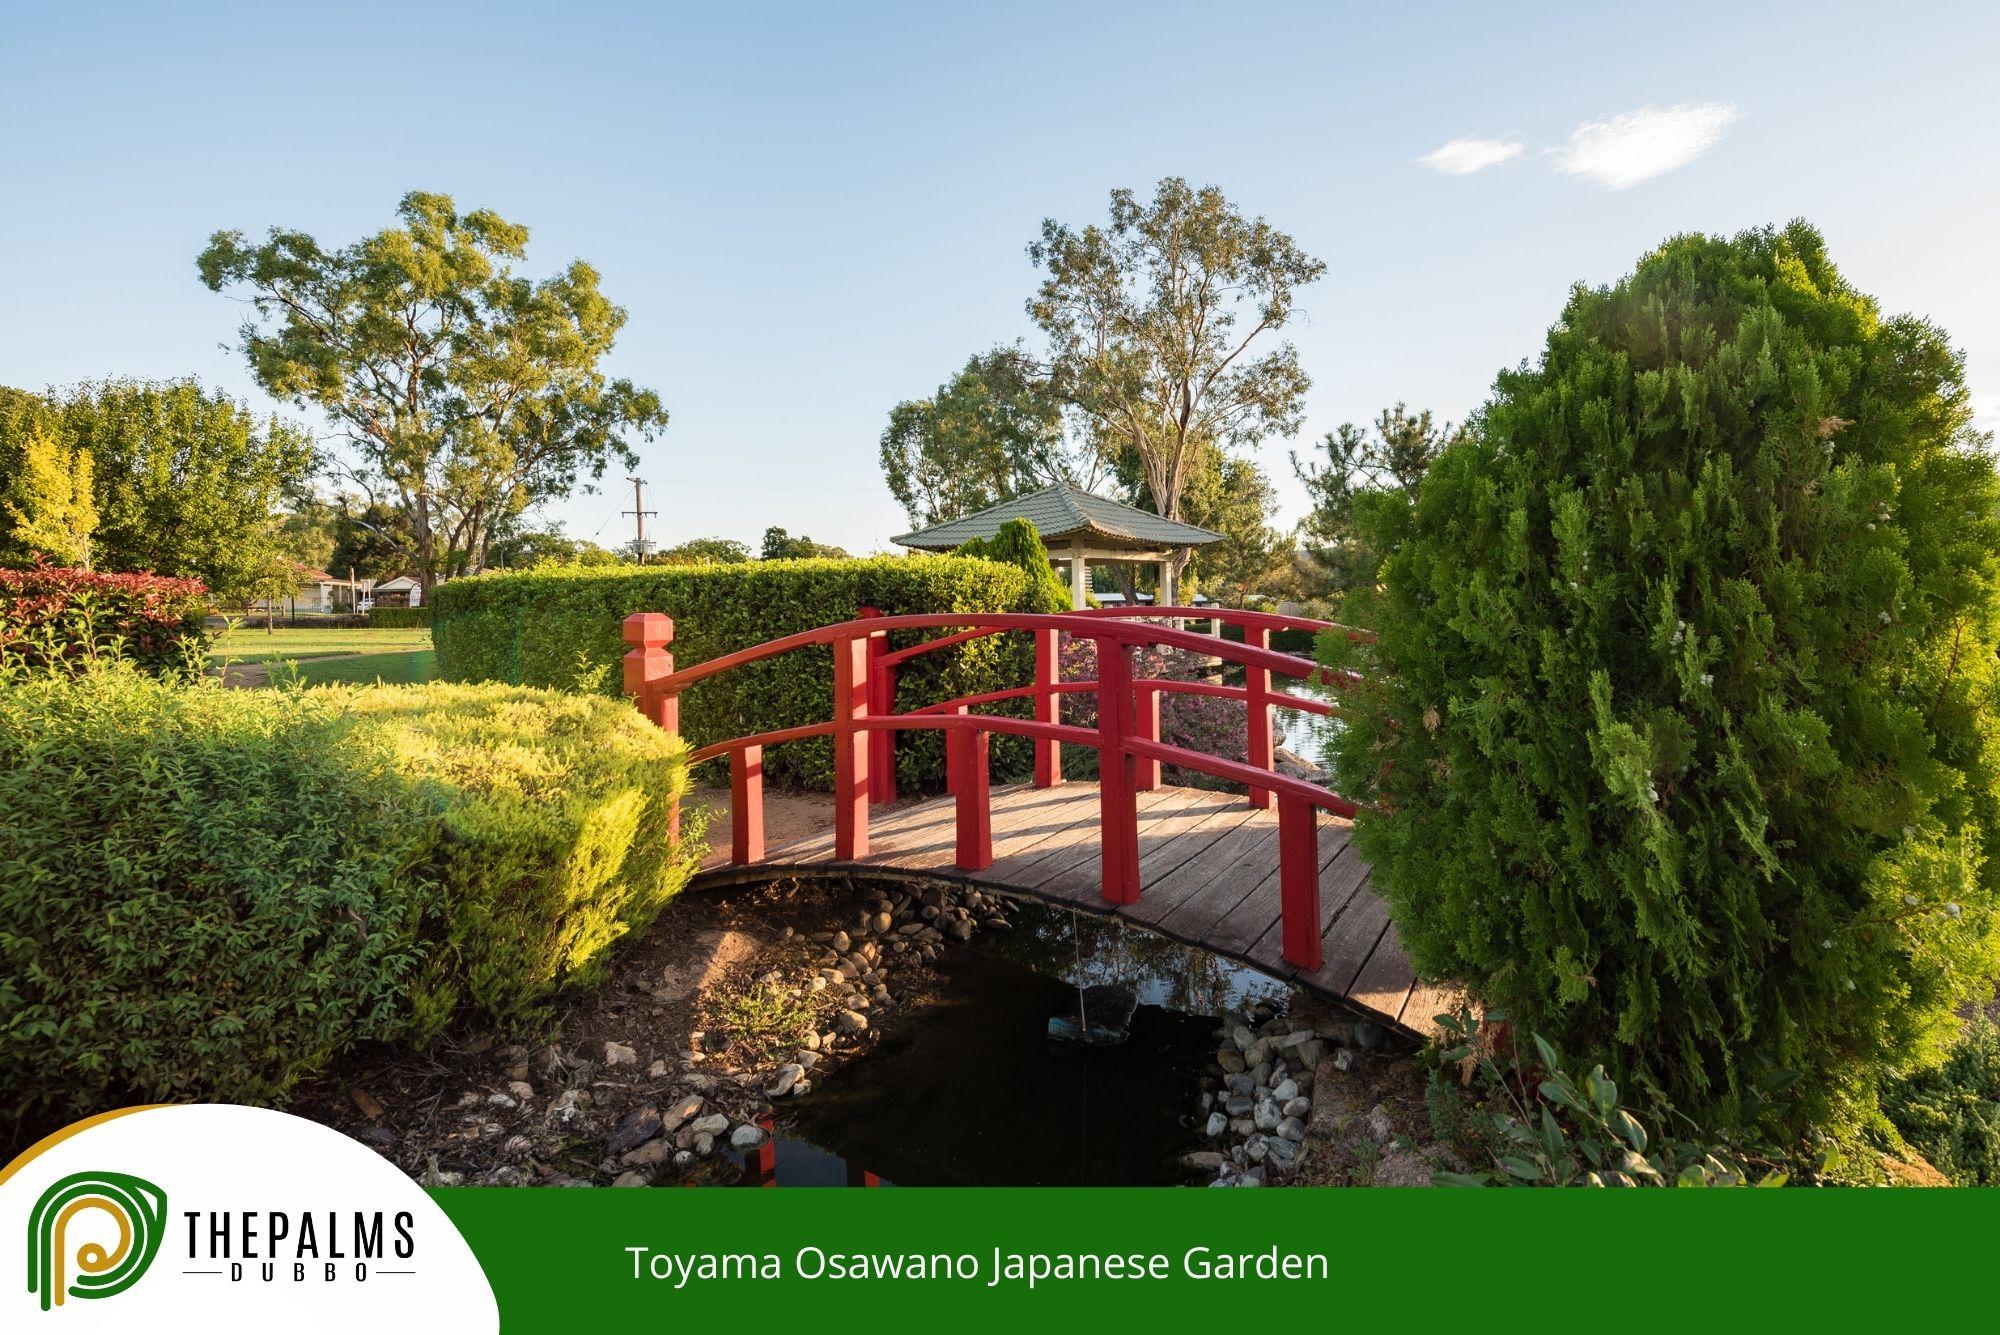 Toyama Osawano Japanese Garden